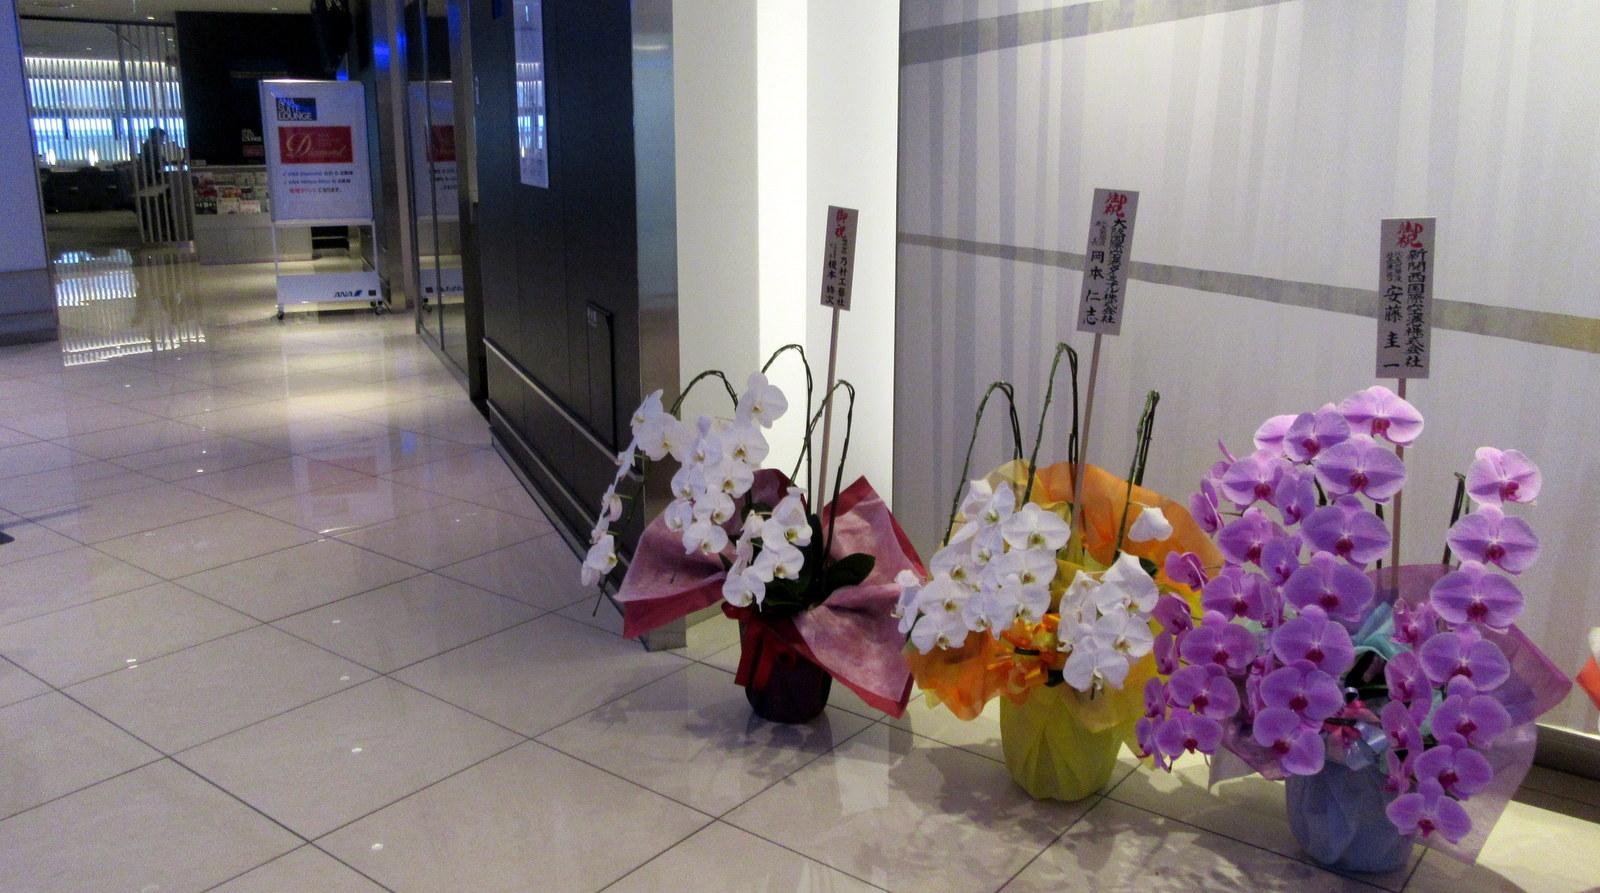 ANA 伊丹空港スイートラウンジ 南ターミナル